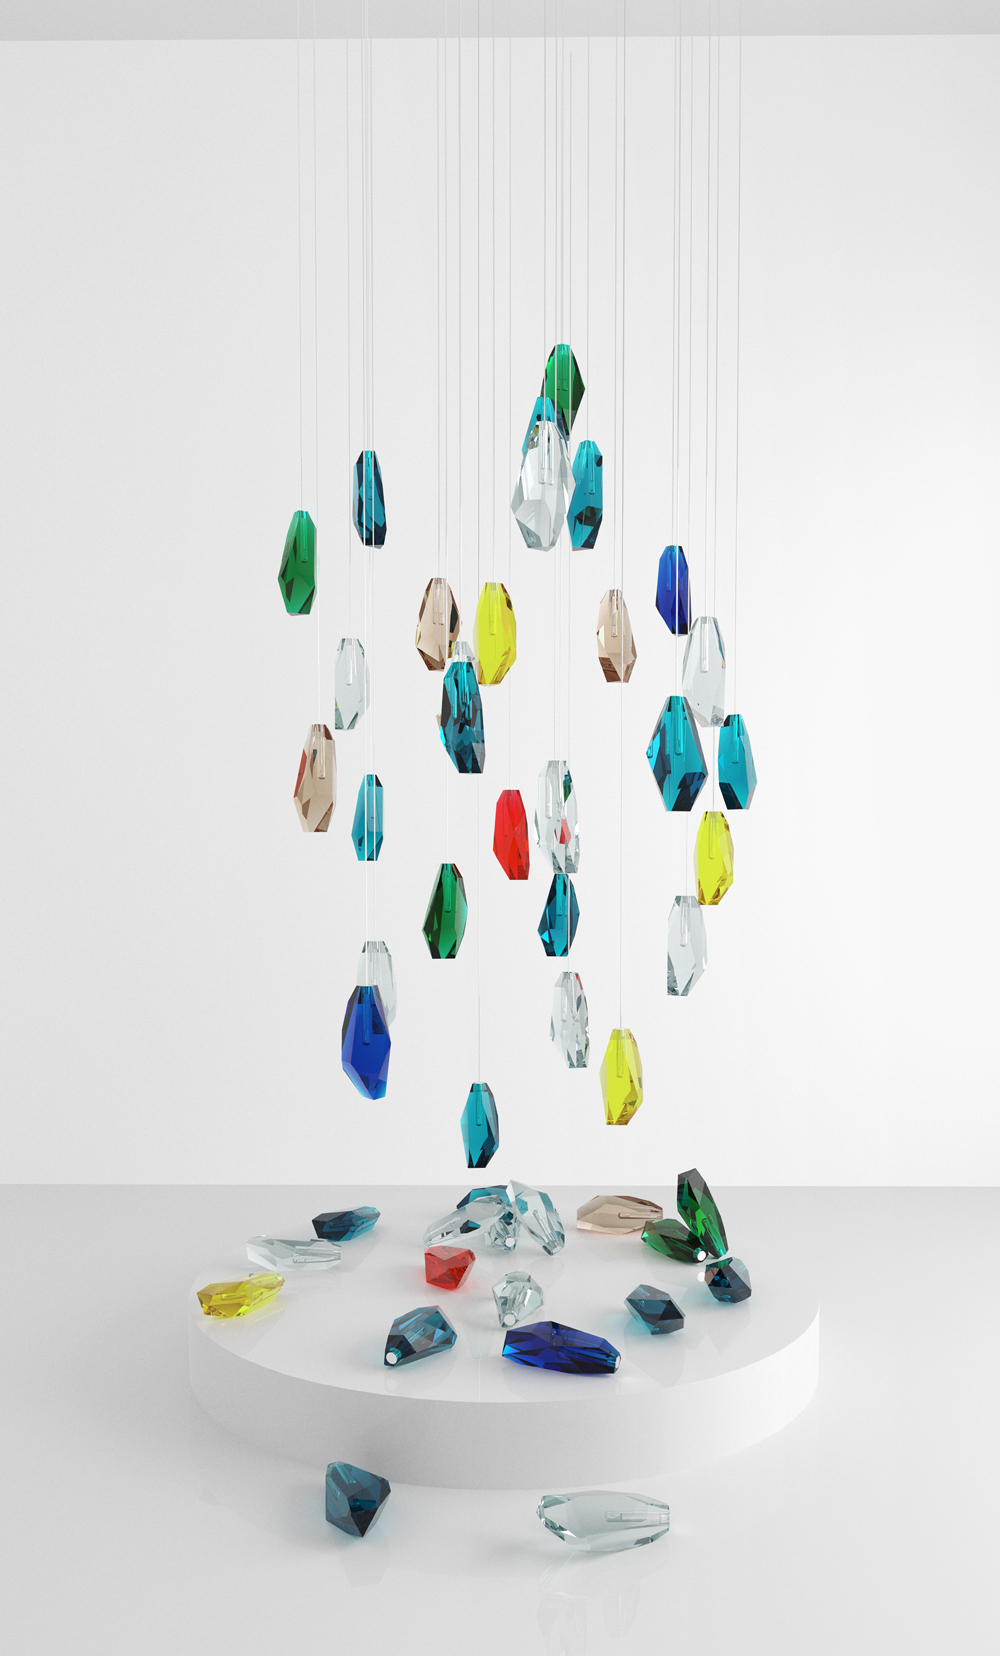 Rock-lamp-composition-resized.jpg